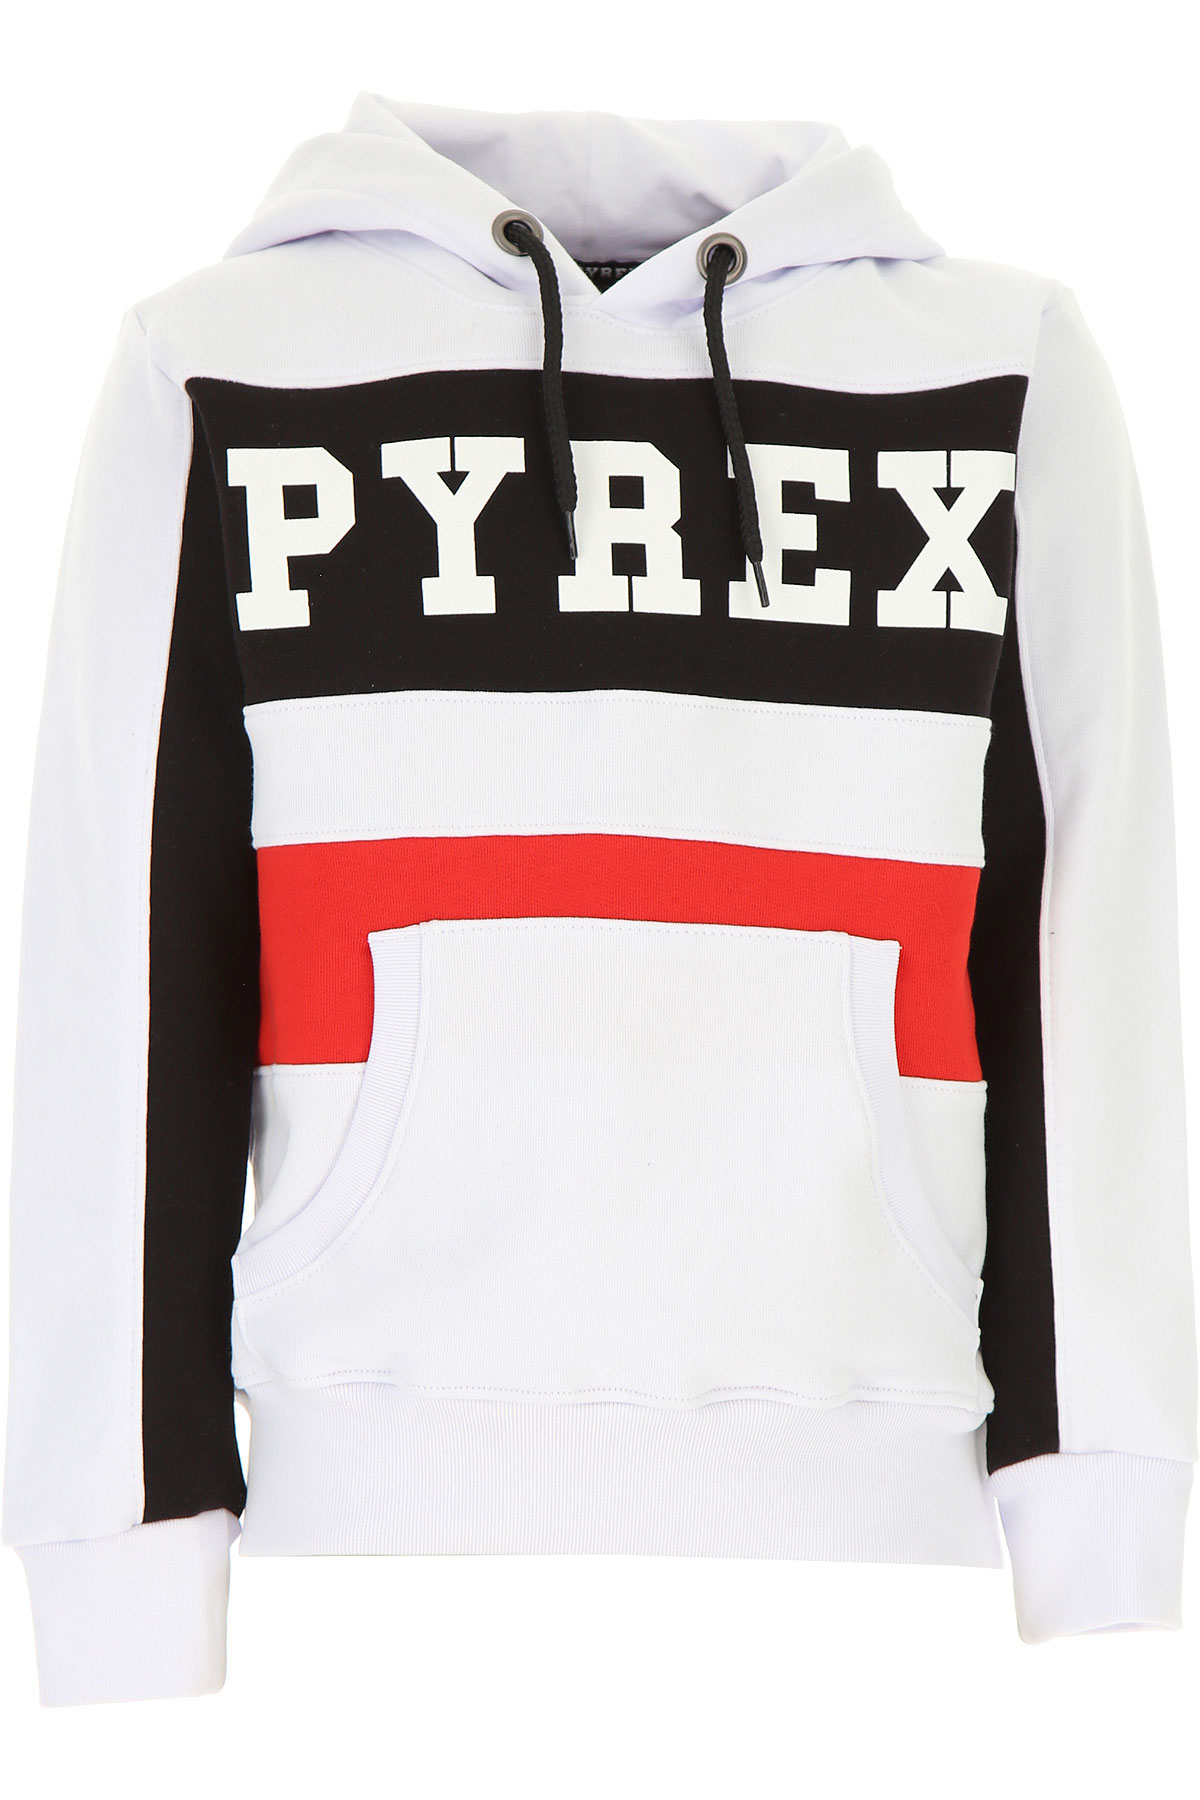 Pyrex Kids Sweatshirts & Hoodies for Boys On Sale, White, Cotton, 2019, M S XS